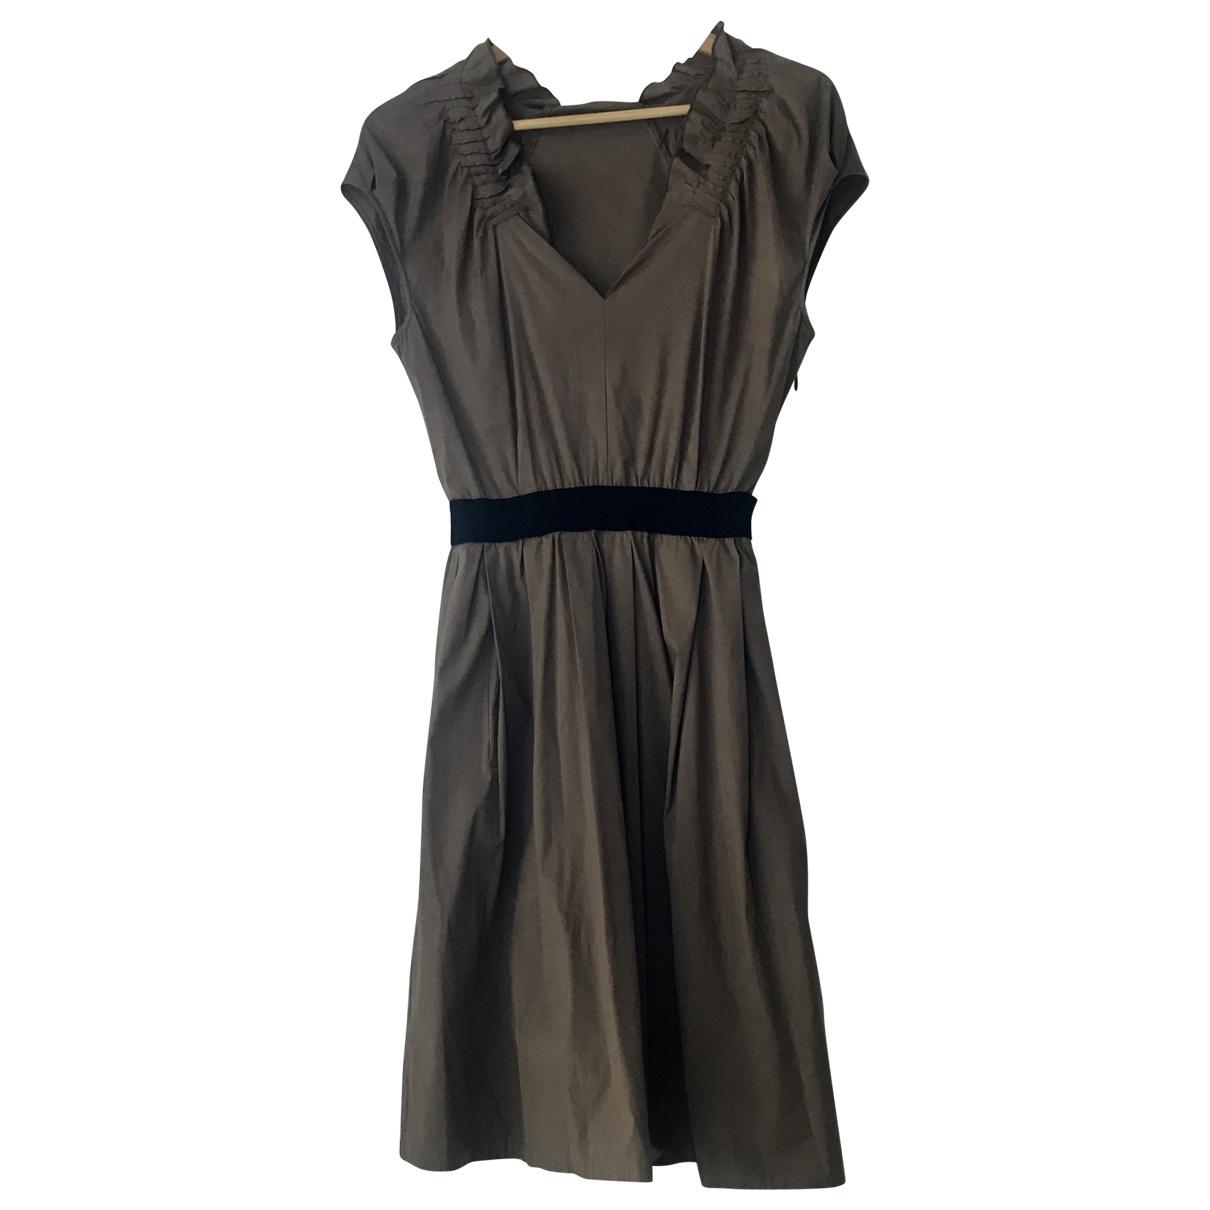 Pinko \N Brown Cotton dress for Women 42 IT